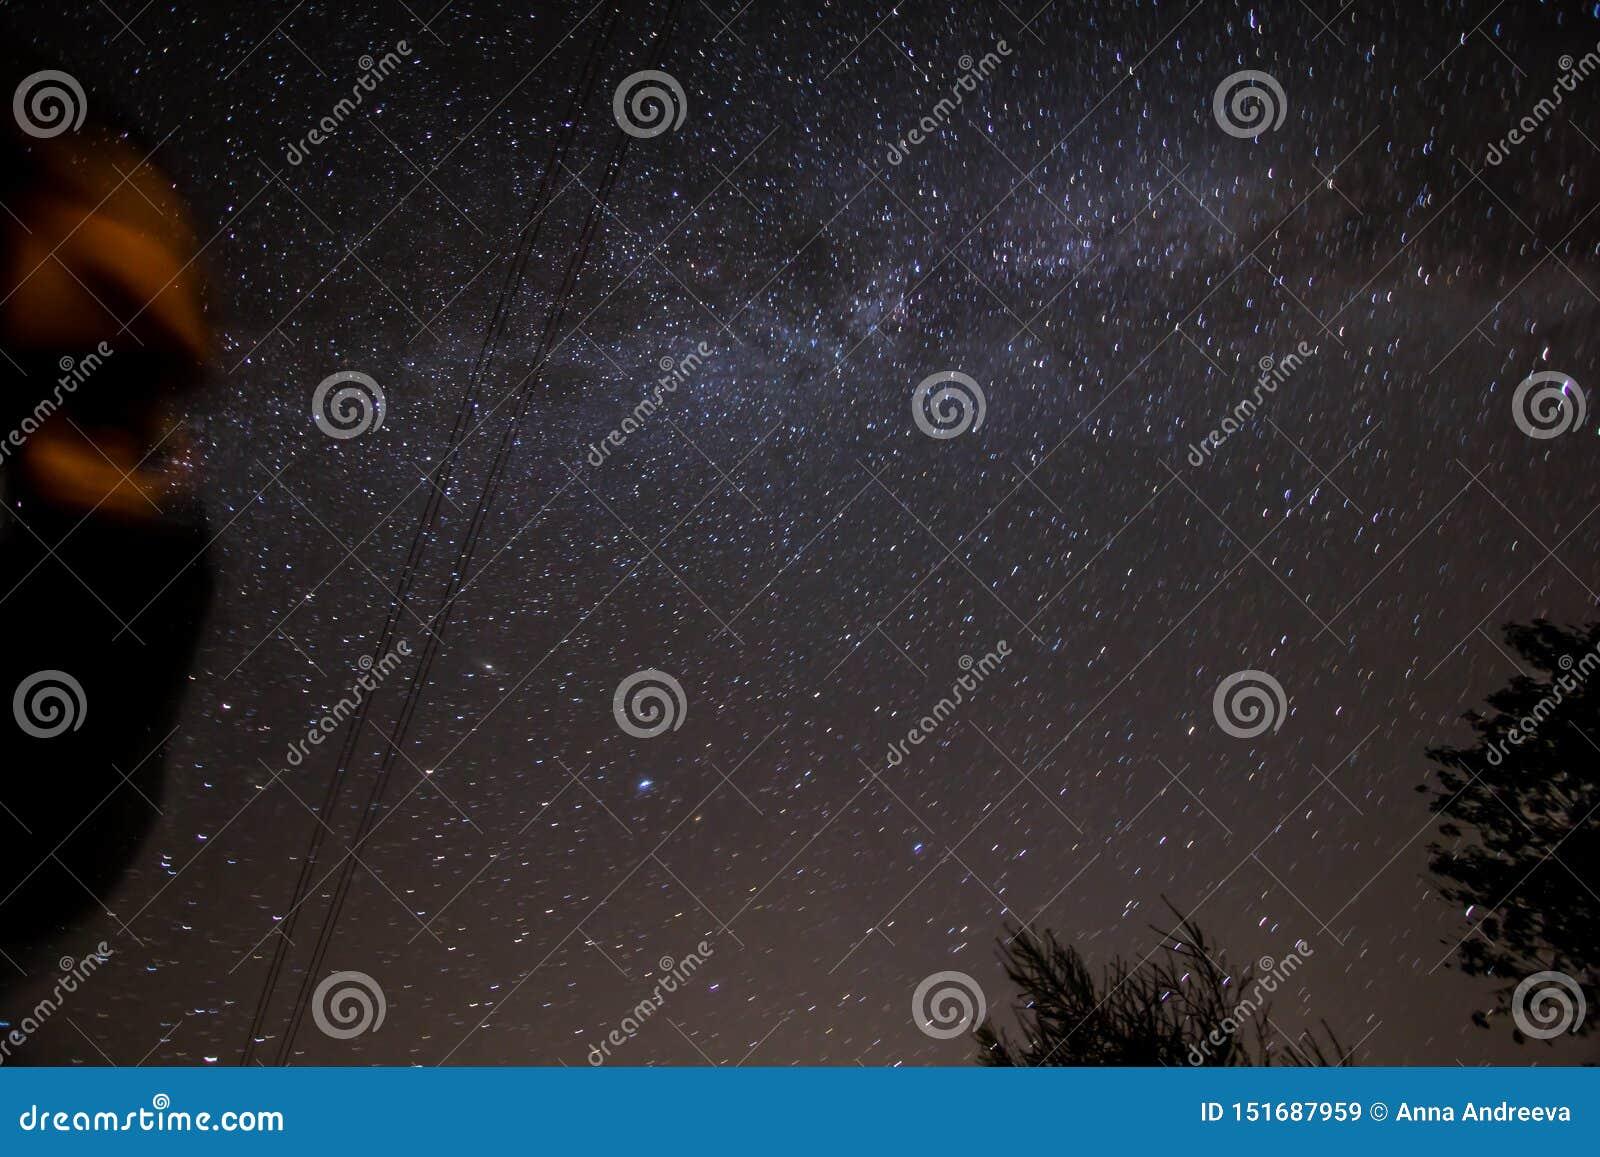 Looking at starry night sky, stars panorama